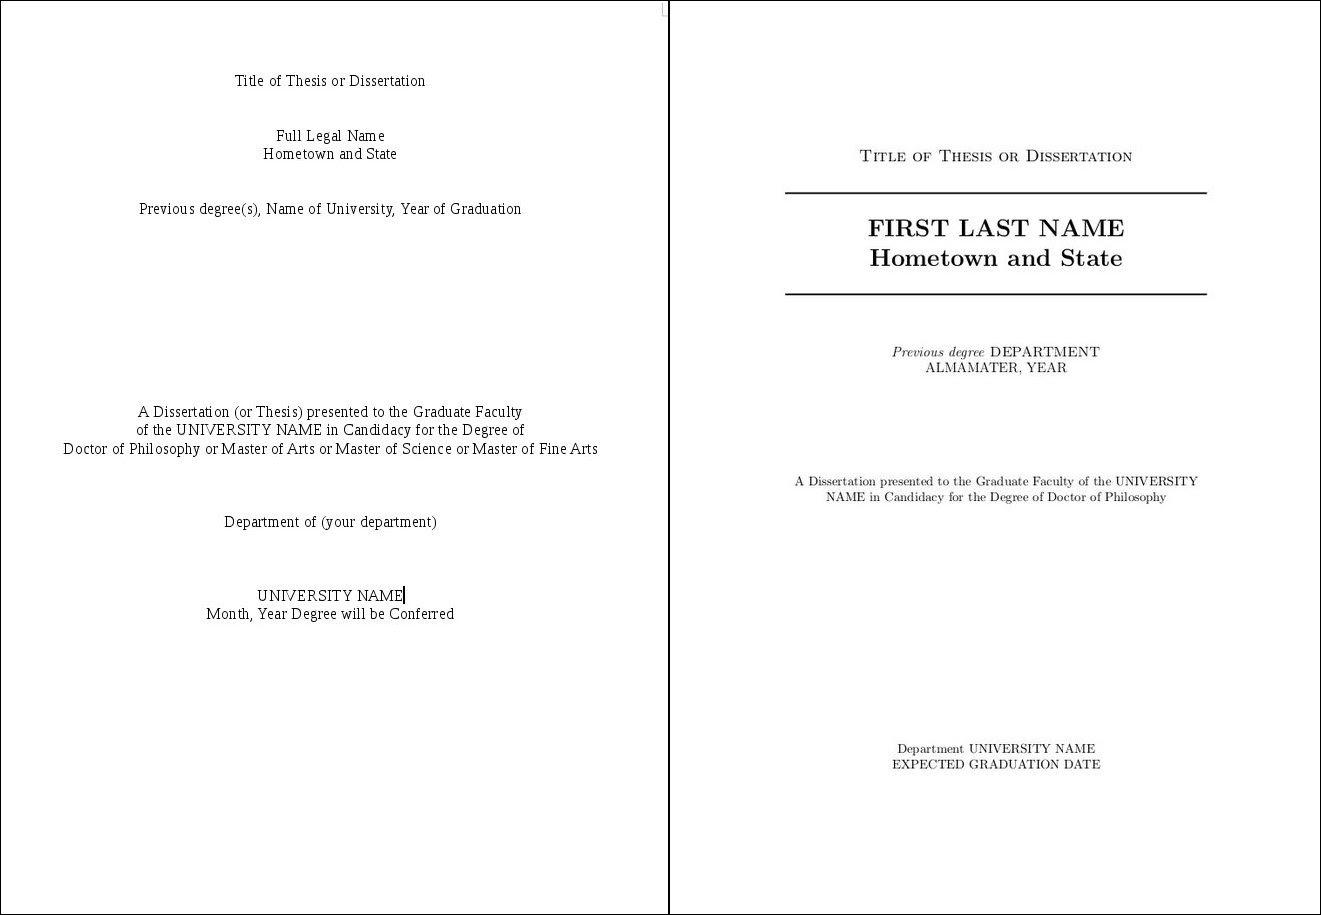 Criminology Thesi Title List Idea For College Fine Art Dissertation Ideas